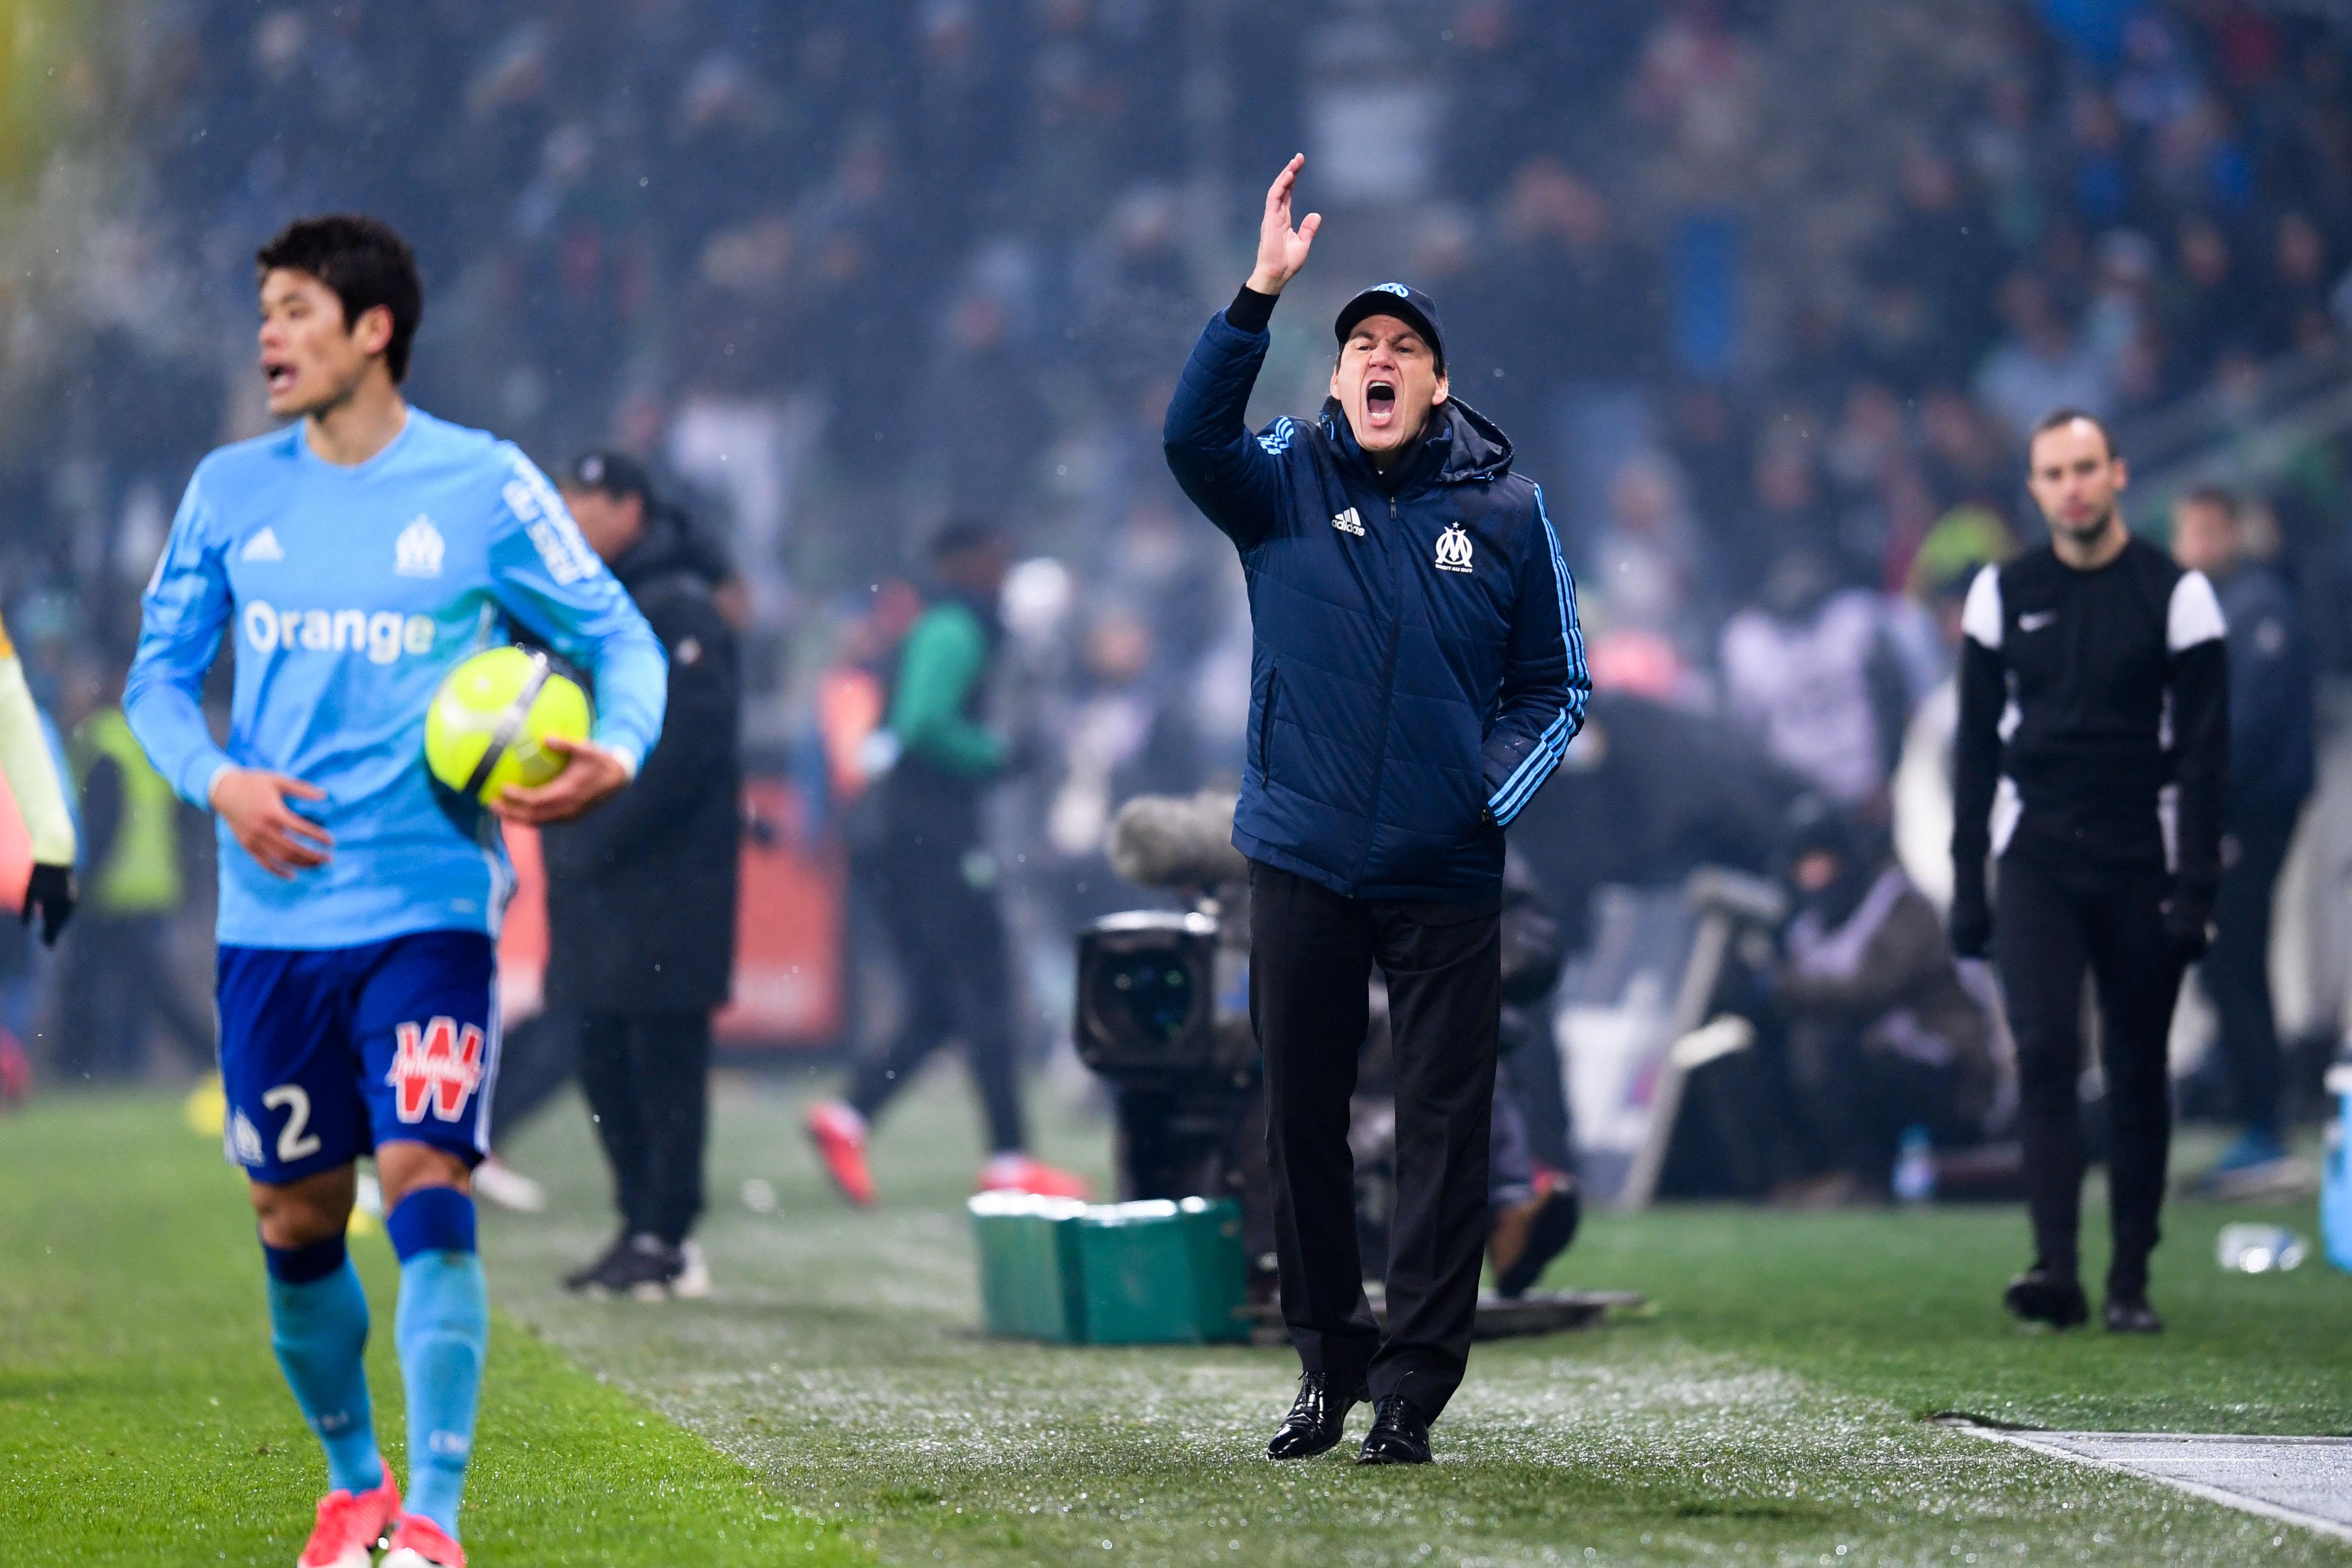 Football - Ligue Europa - OM-Braga, le plus dur commence pour Marseille